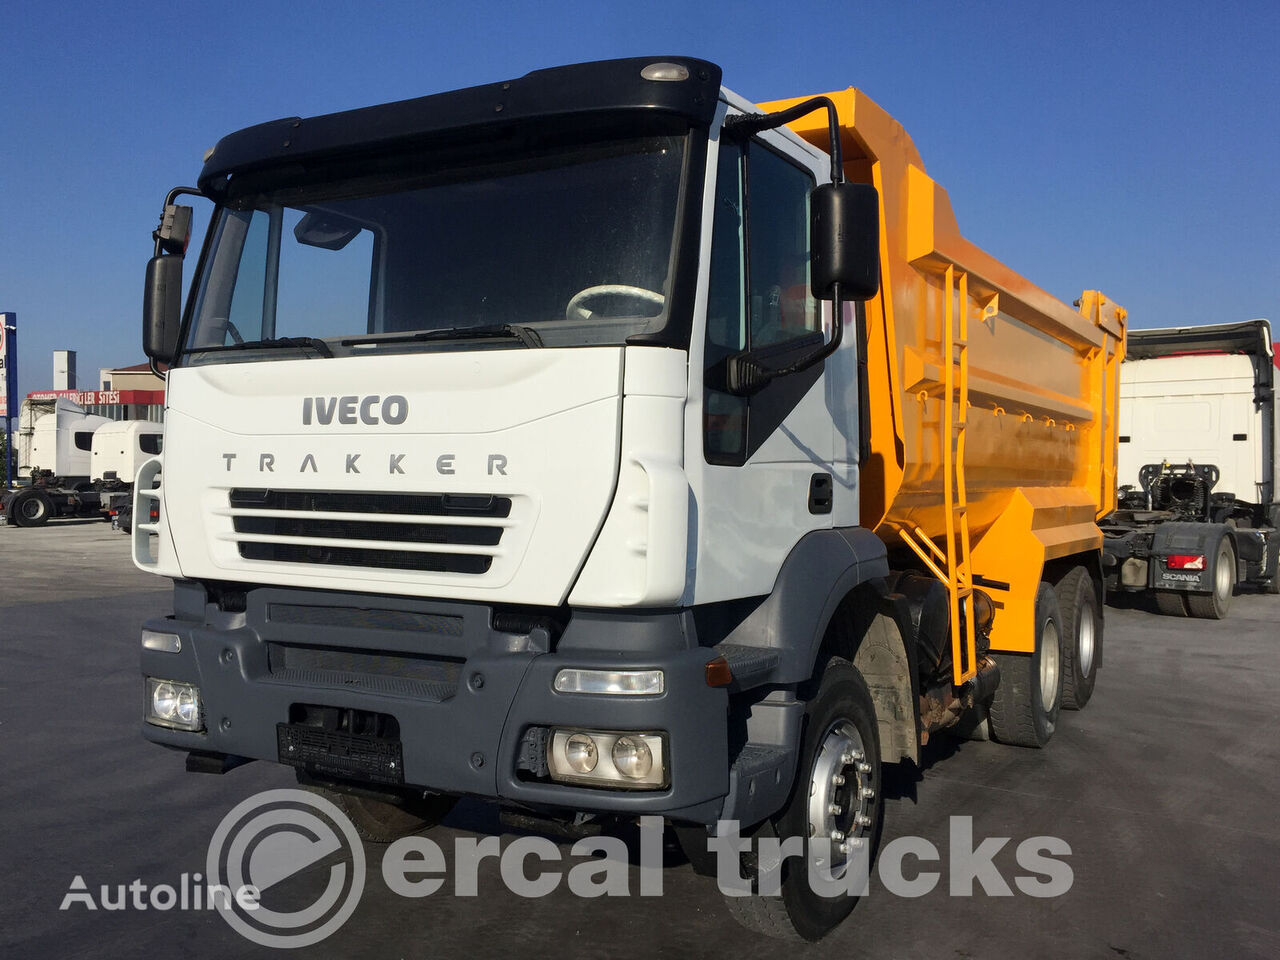 IVECO 2008 TRAKKER 380 6X4 EURO 3 HARDOX TIPPER dump truck